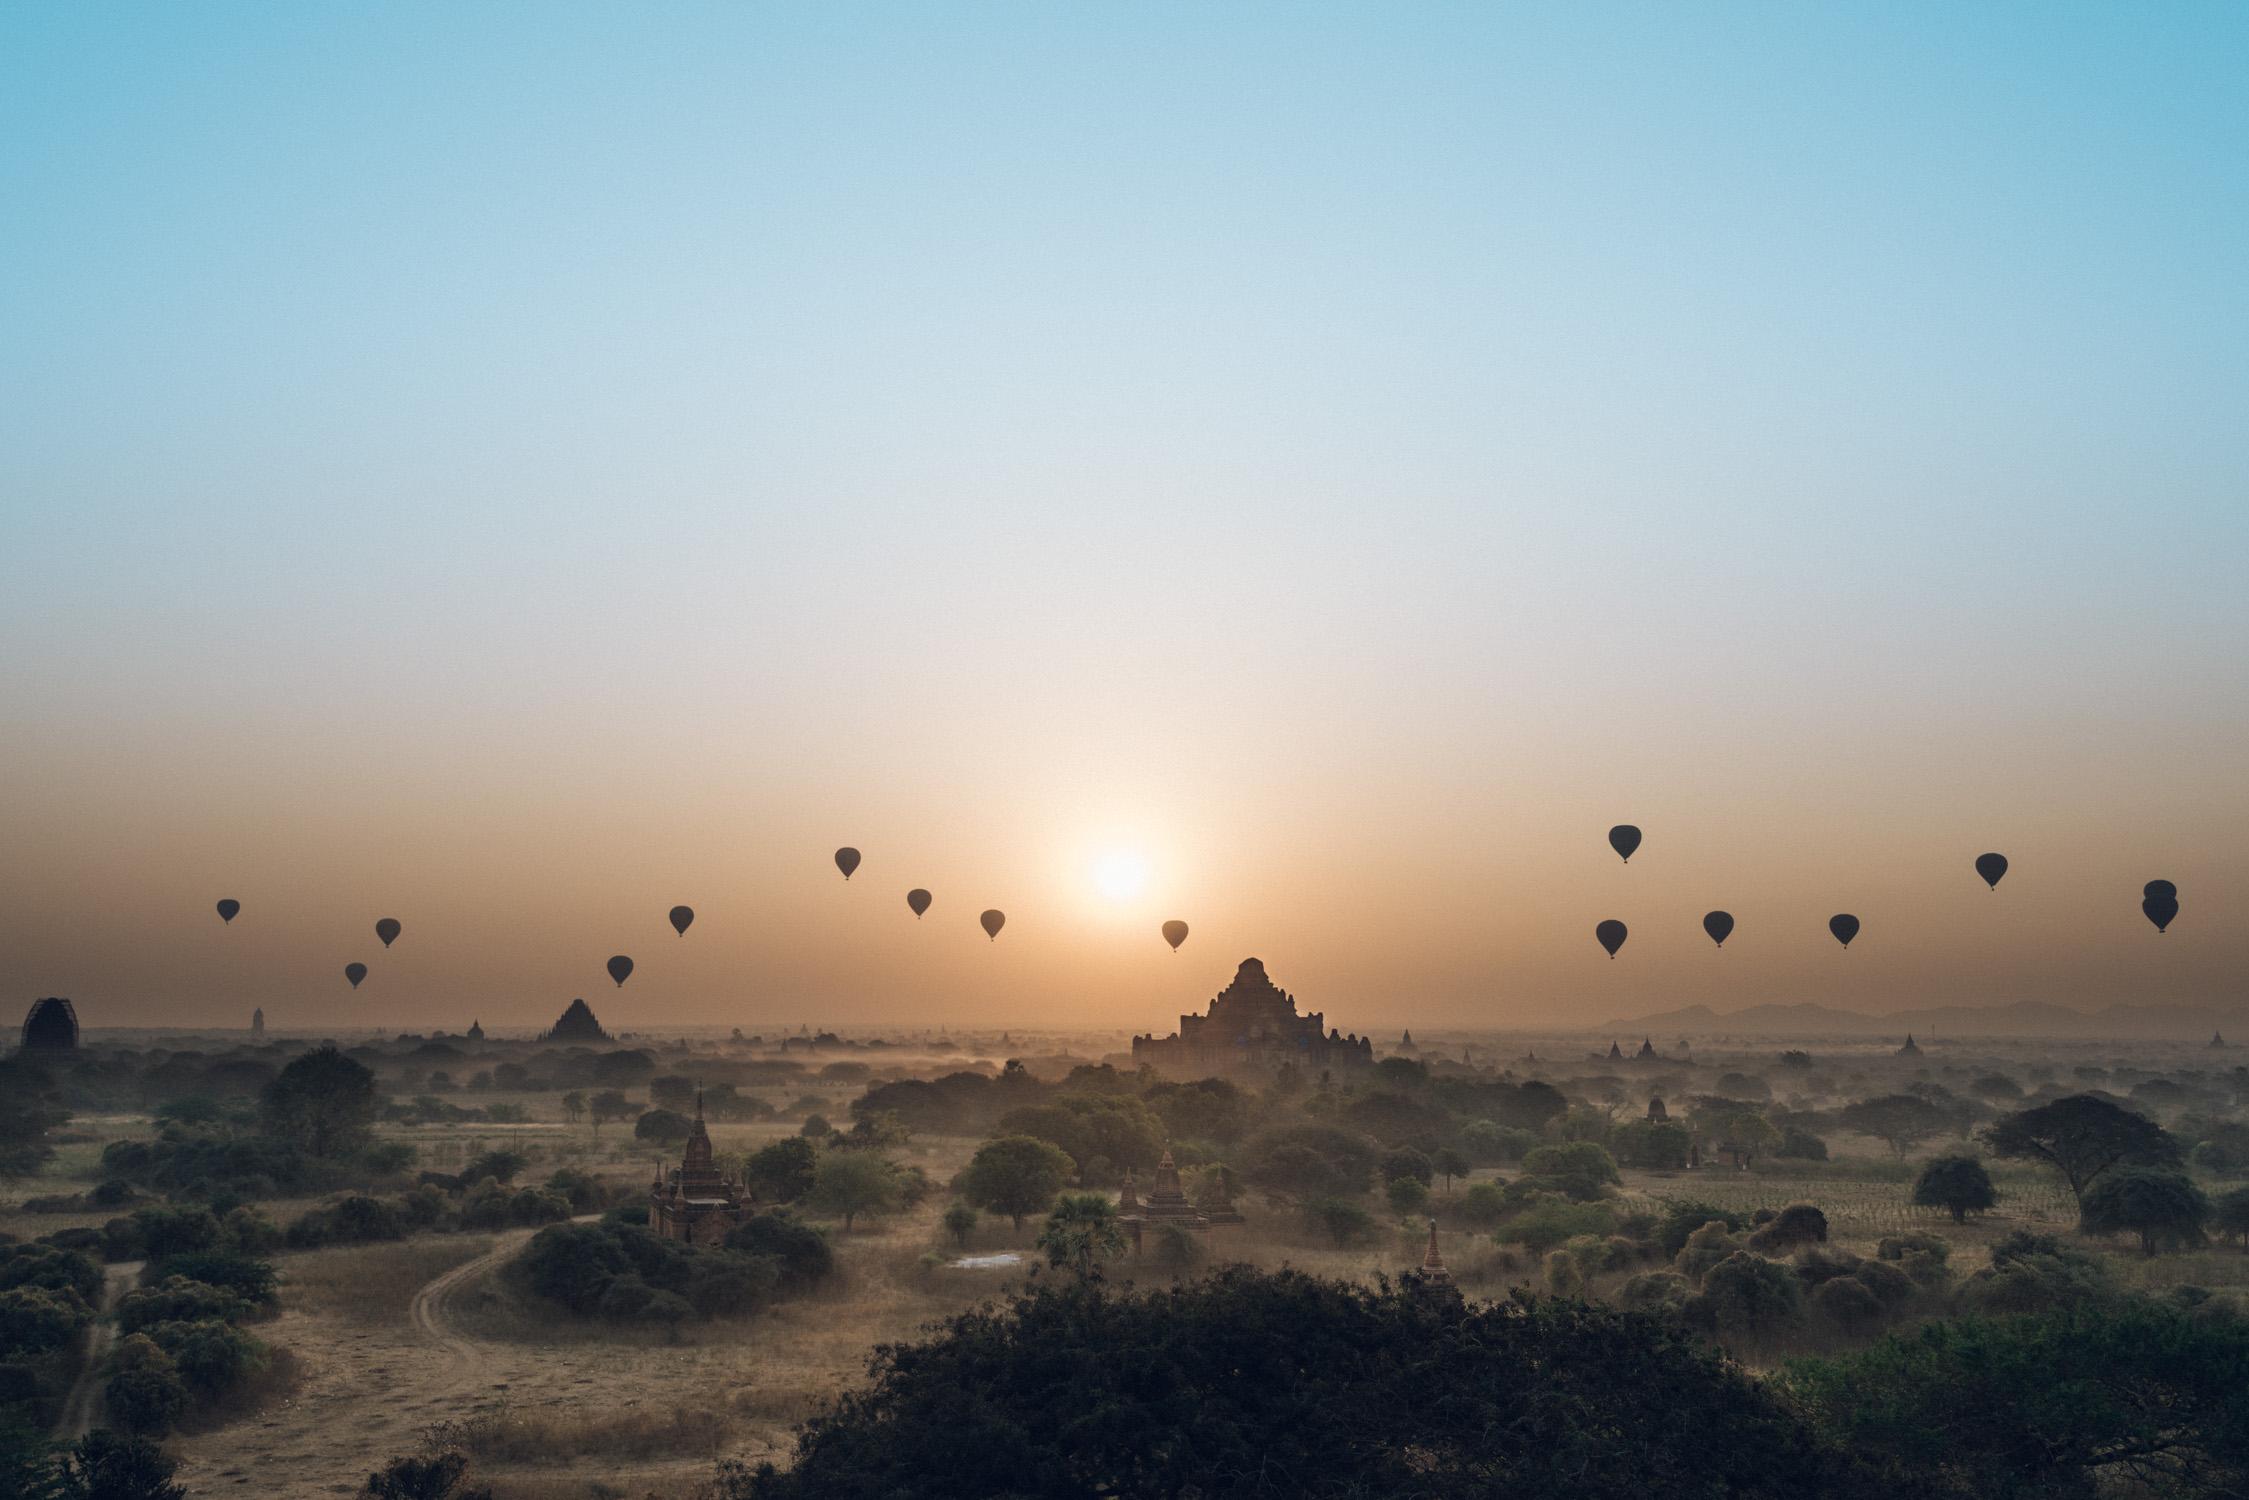 Bagan sunrise landscape with hot air balloon [David Tan]